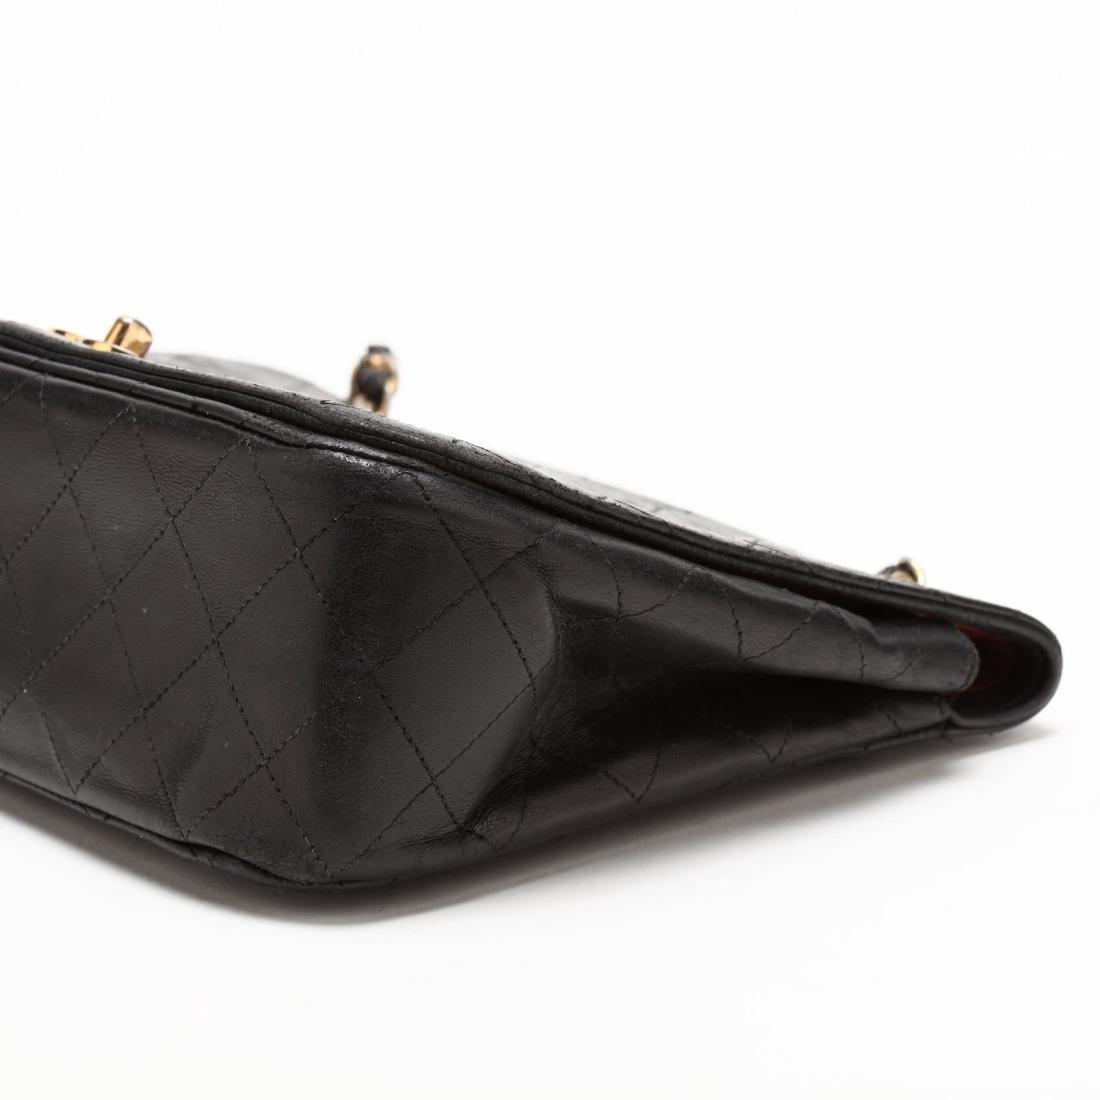 Vintage Full Flap Crossbody Bag, Chanel - 4